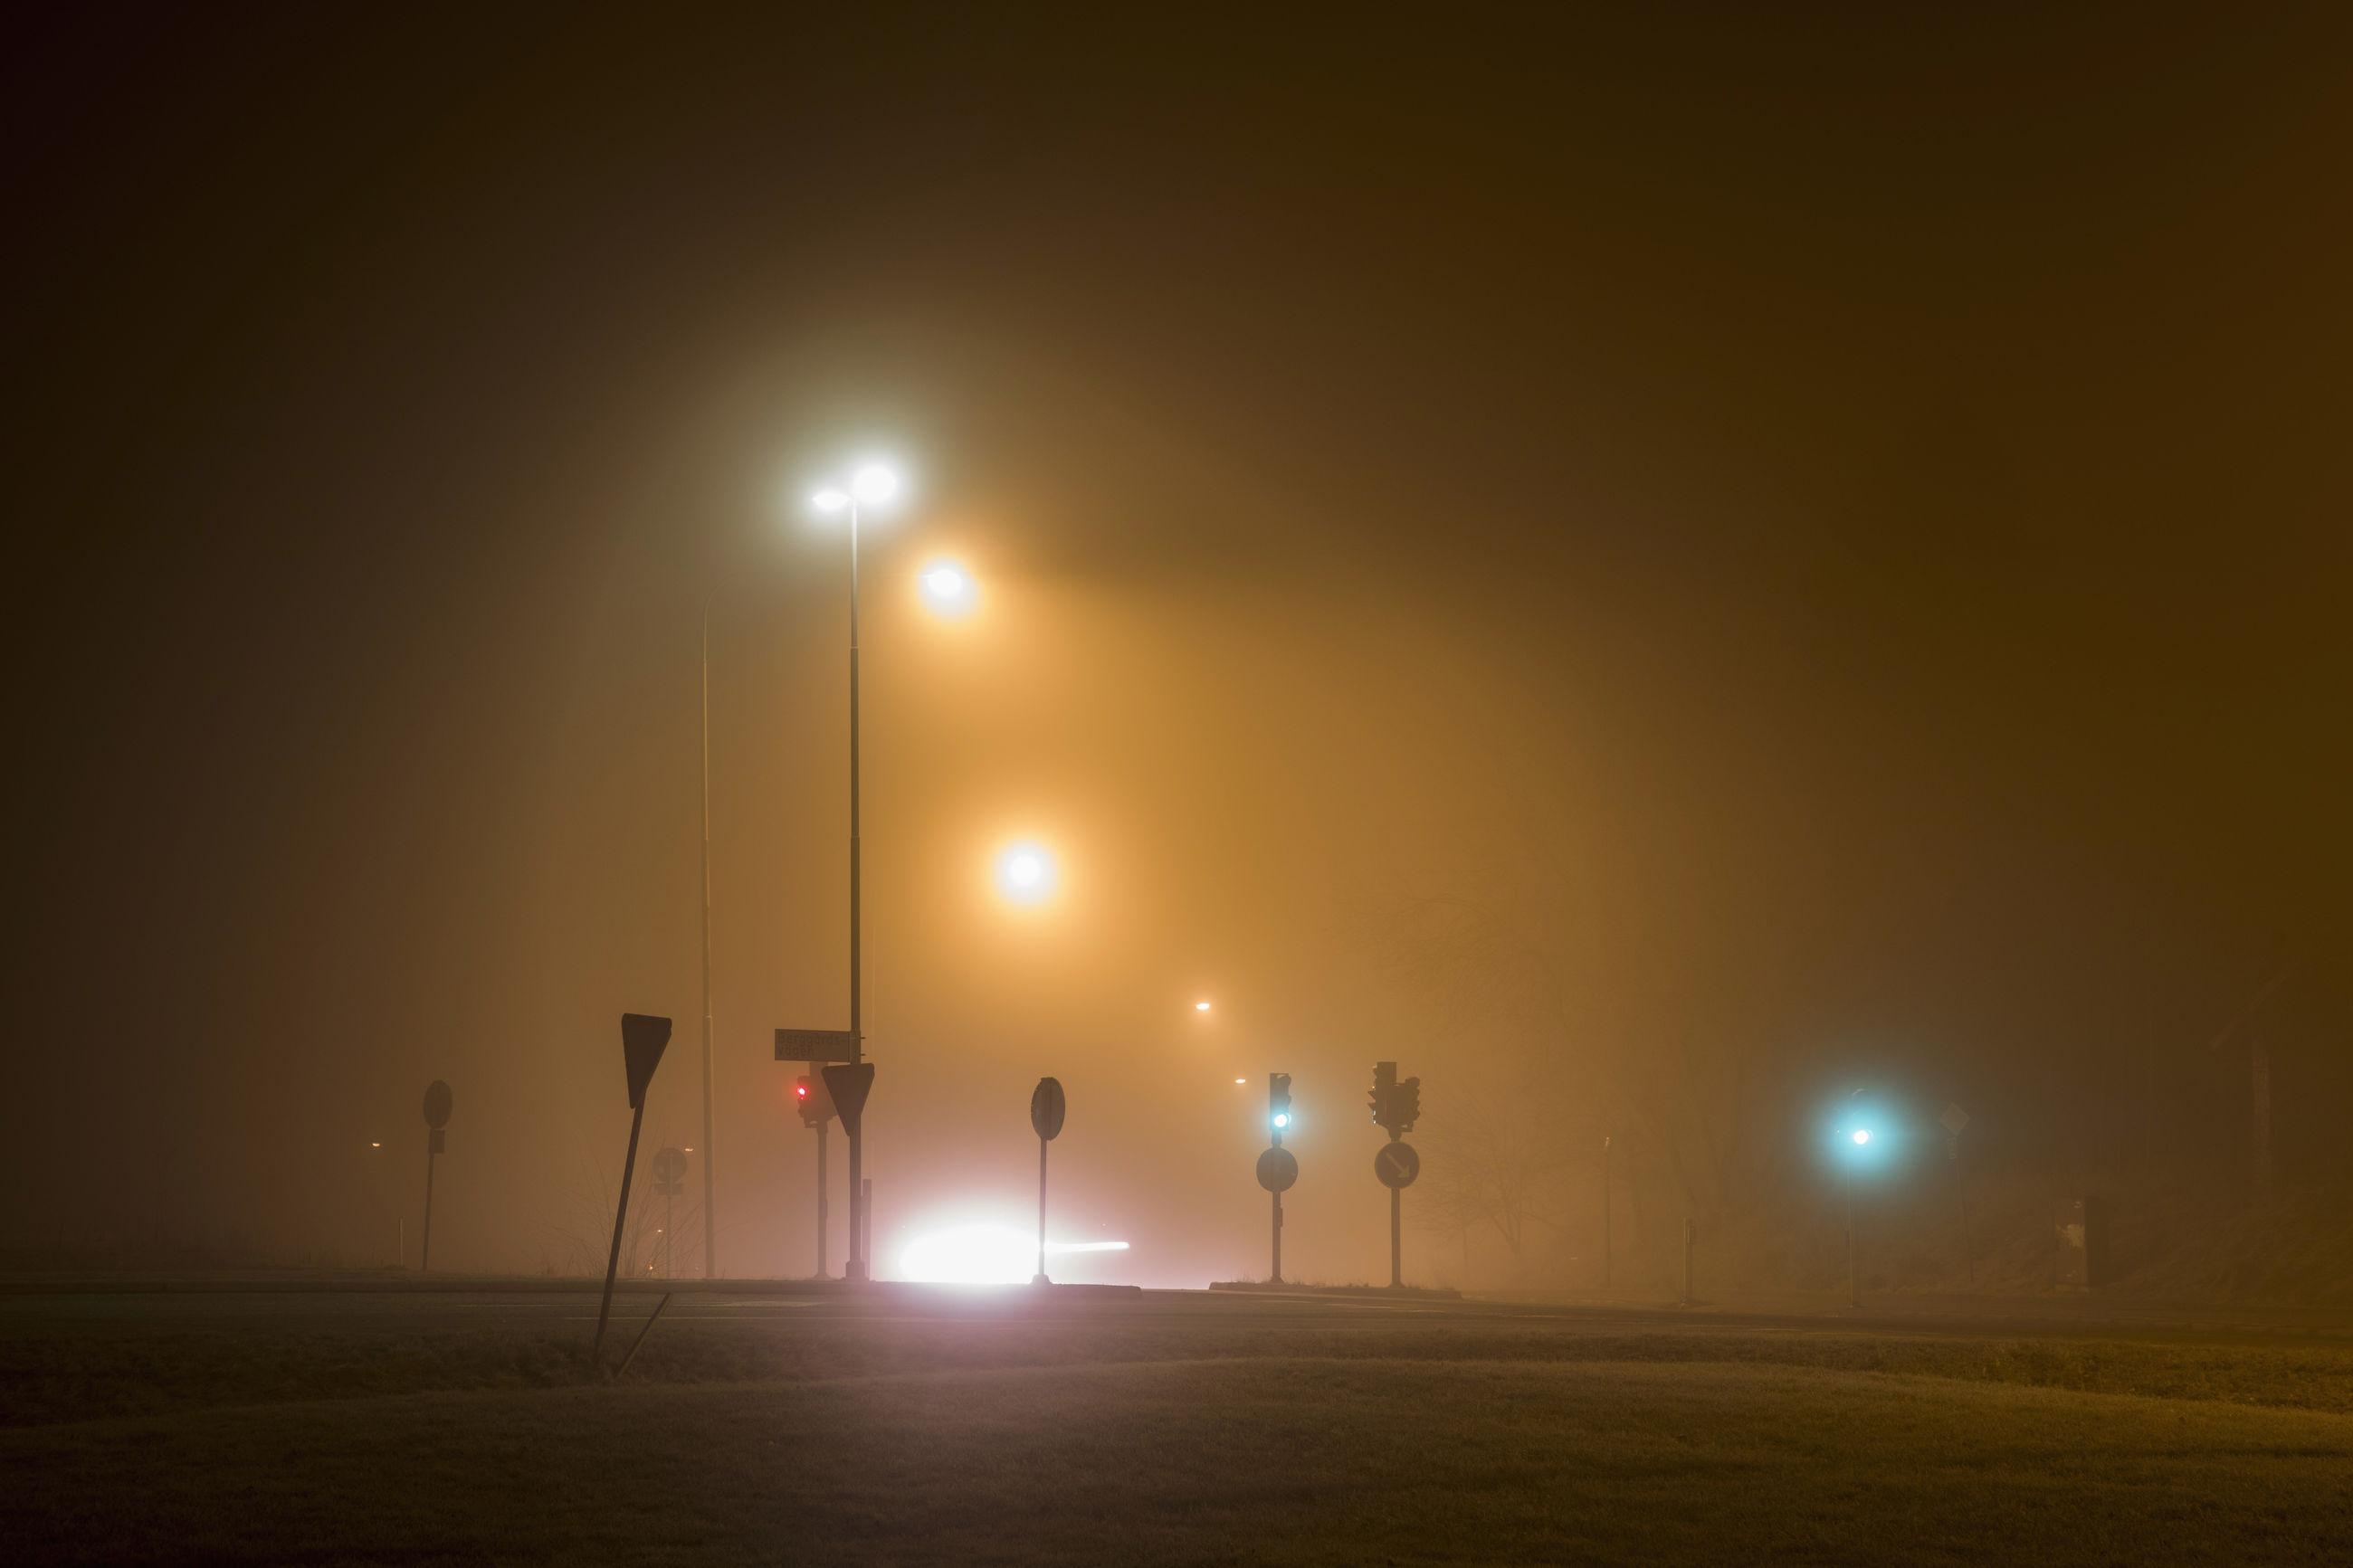 ILLUMINATED STREET LIGHT AGAINST SKY DURING NIGHT